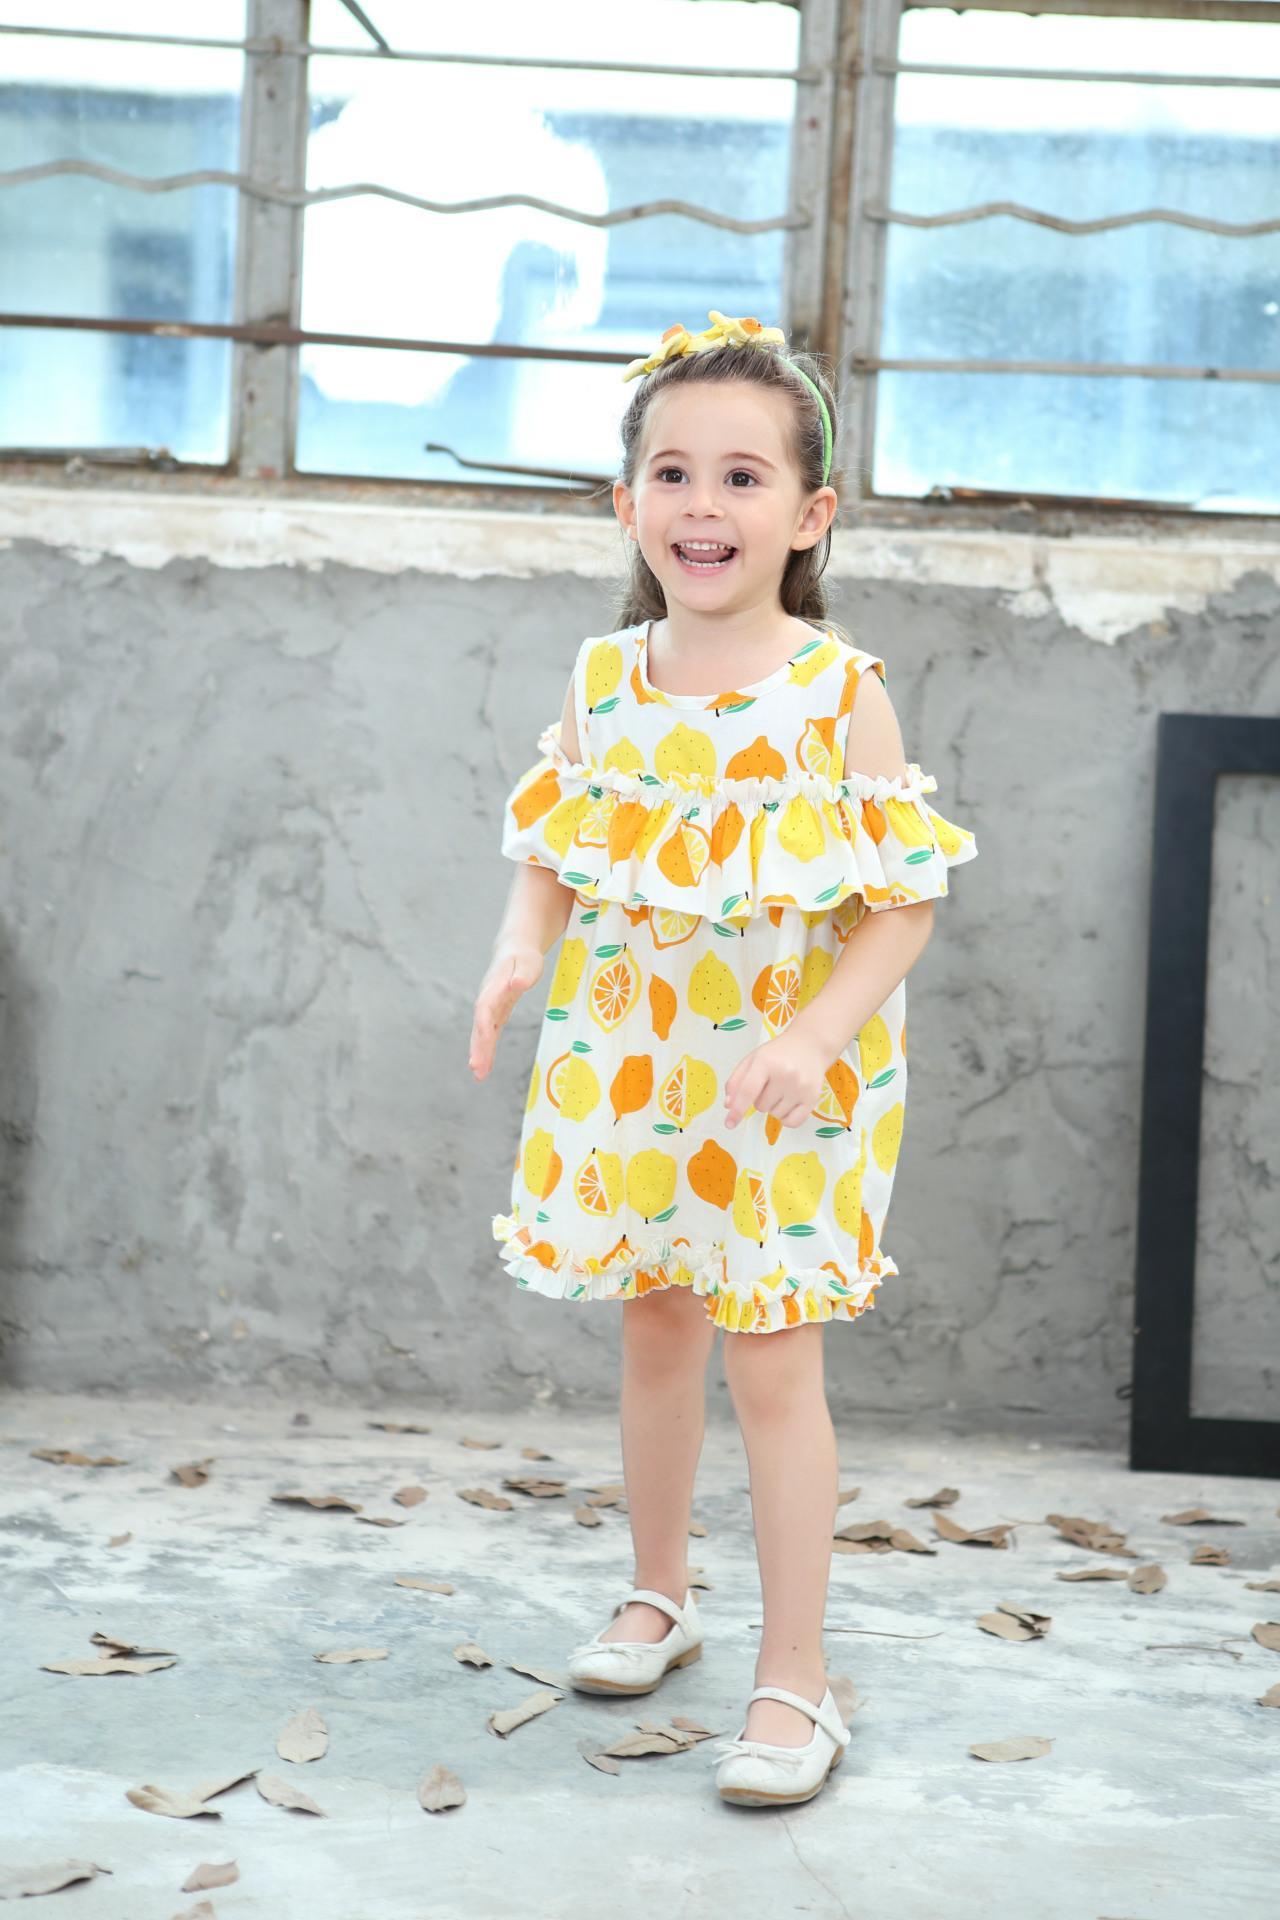 Lemon Printd Girls Dress 2018 New Summer Fashion Children Princess Dress Kids Children Clothes For 2 3 4 5 6 7 8 Years 2